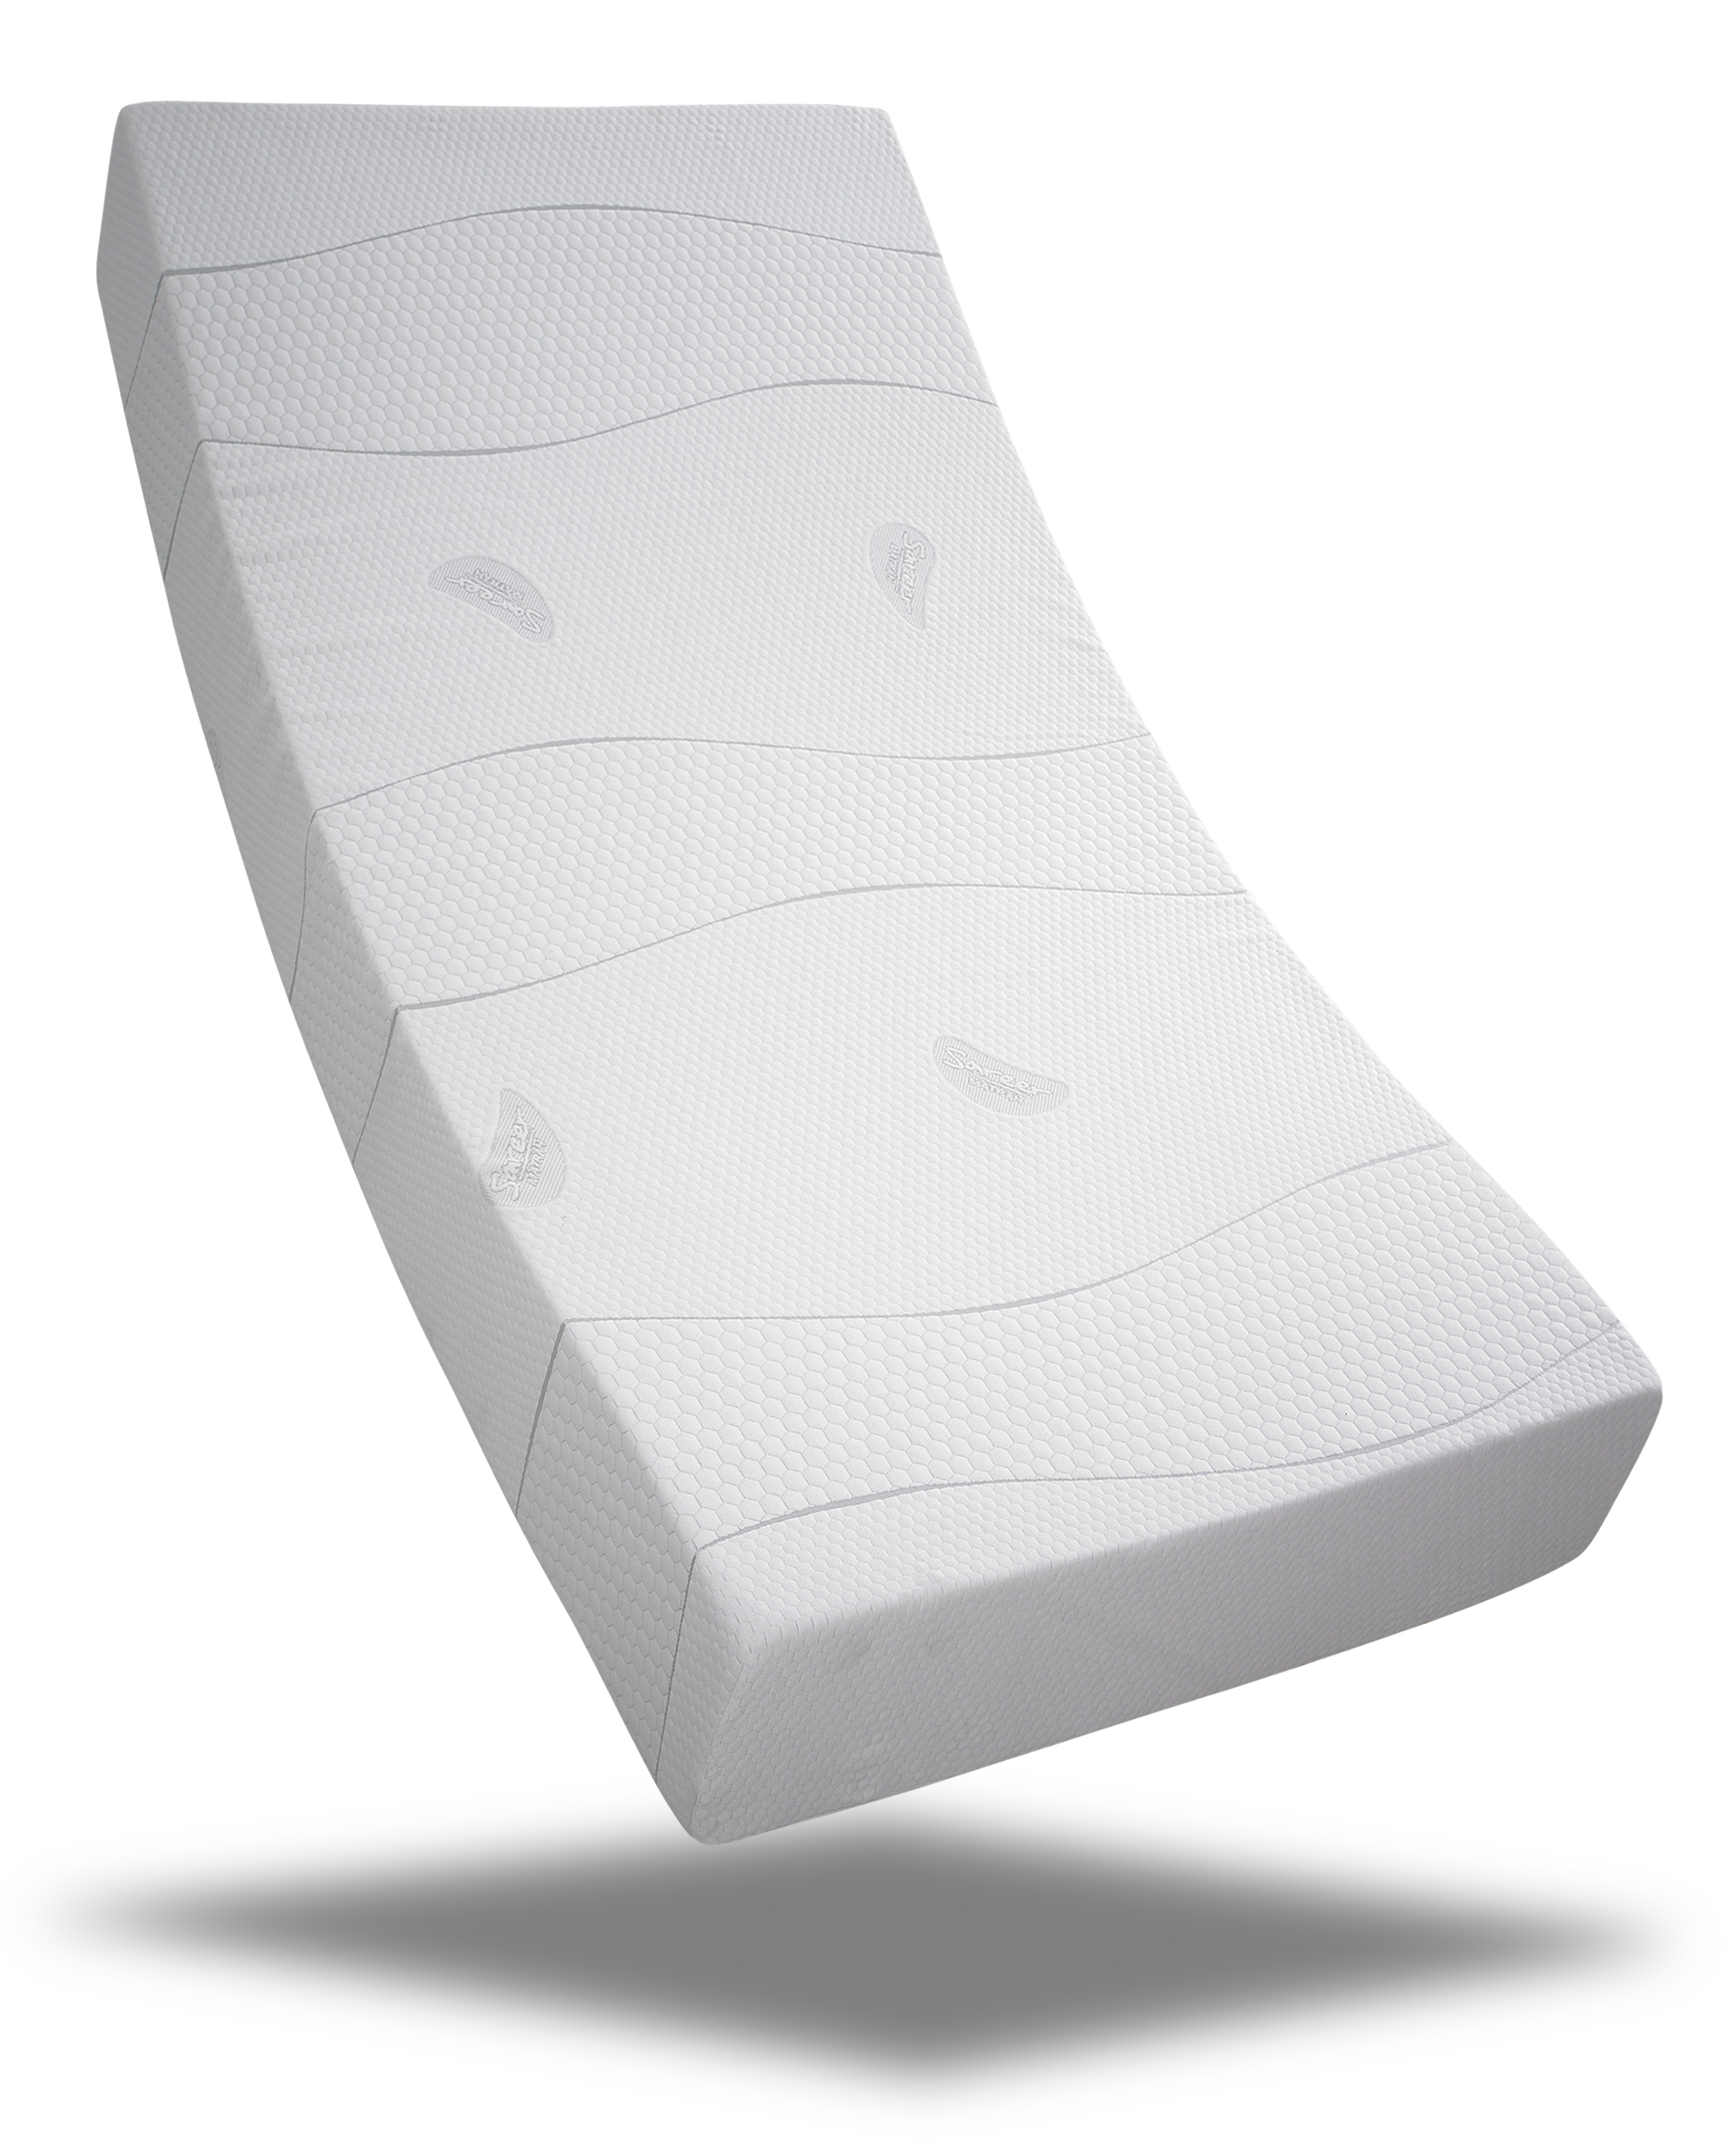 Memory Foam Mattress 6 Inch Or 8 Inch Depth Sensation